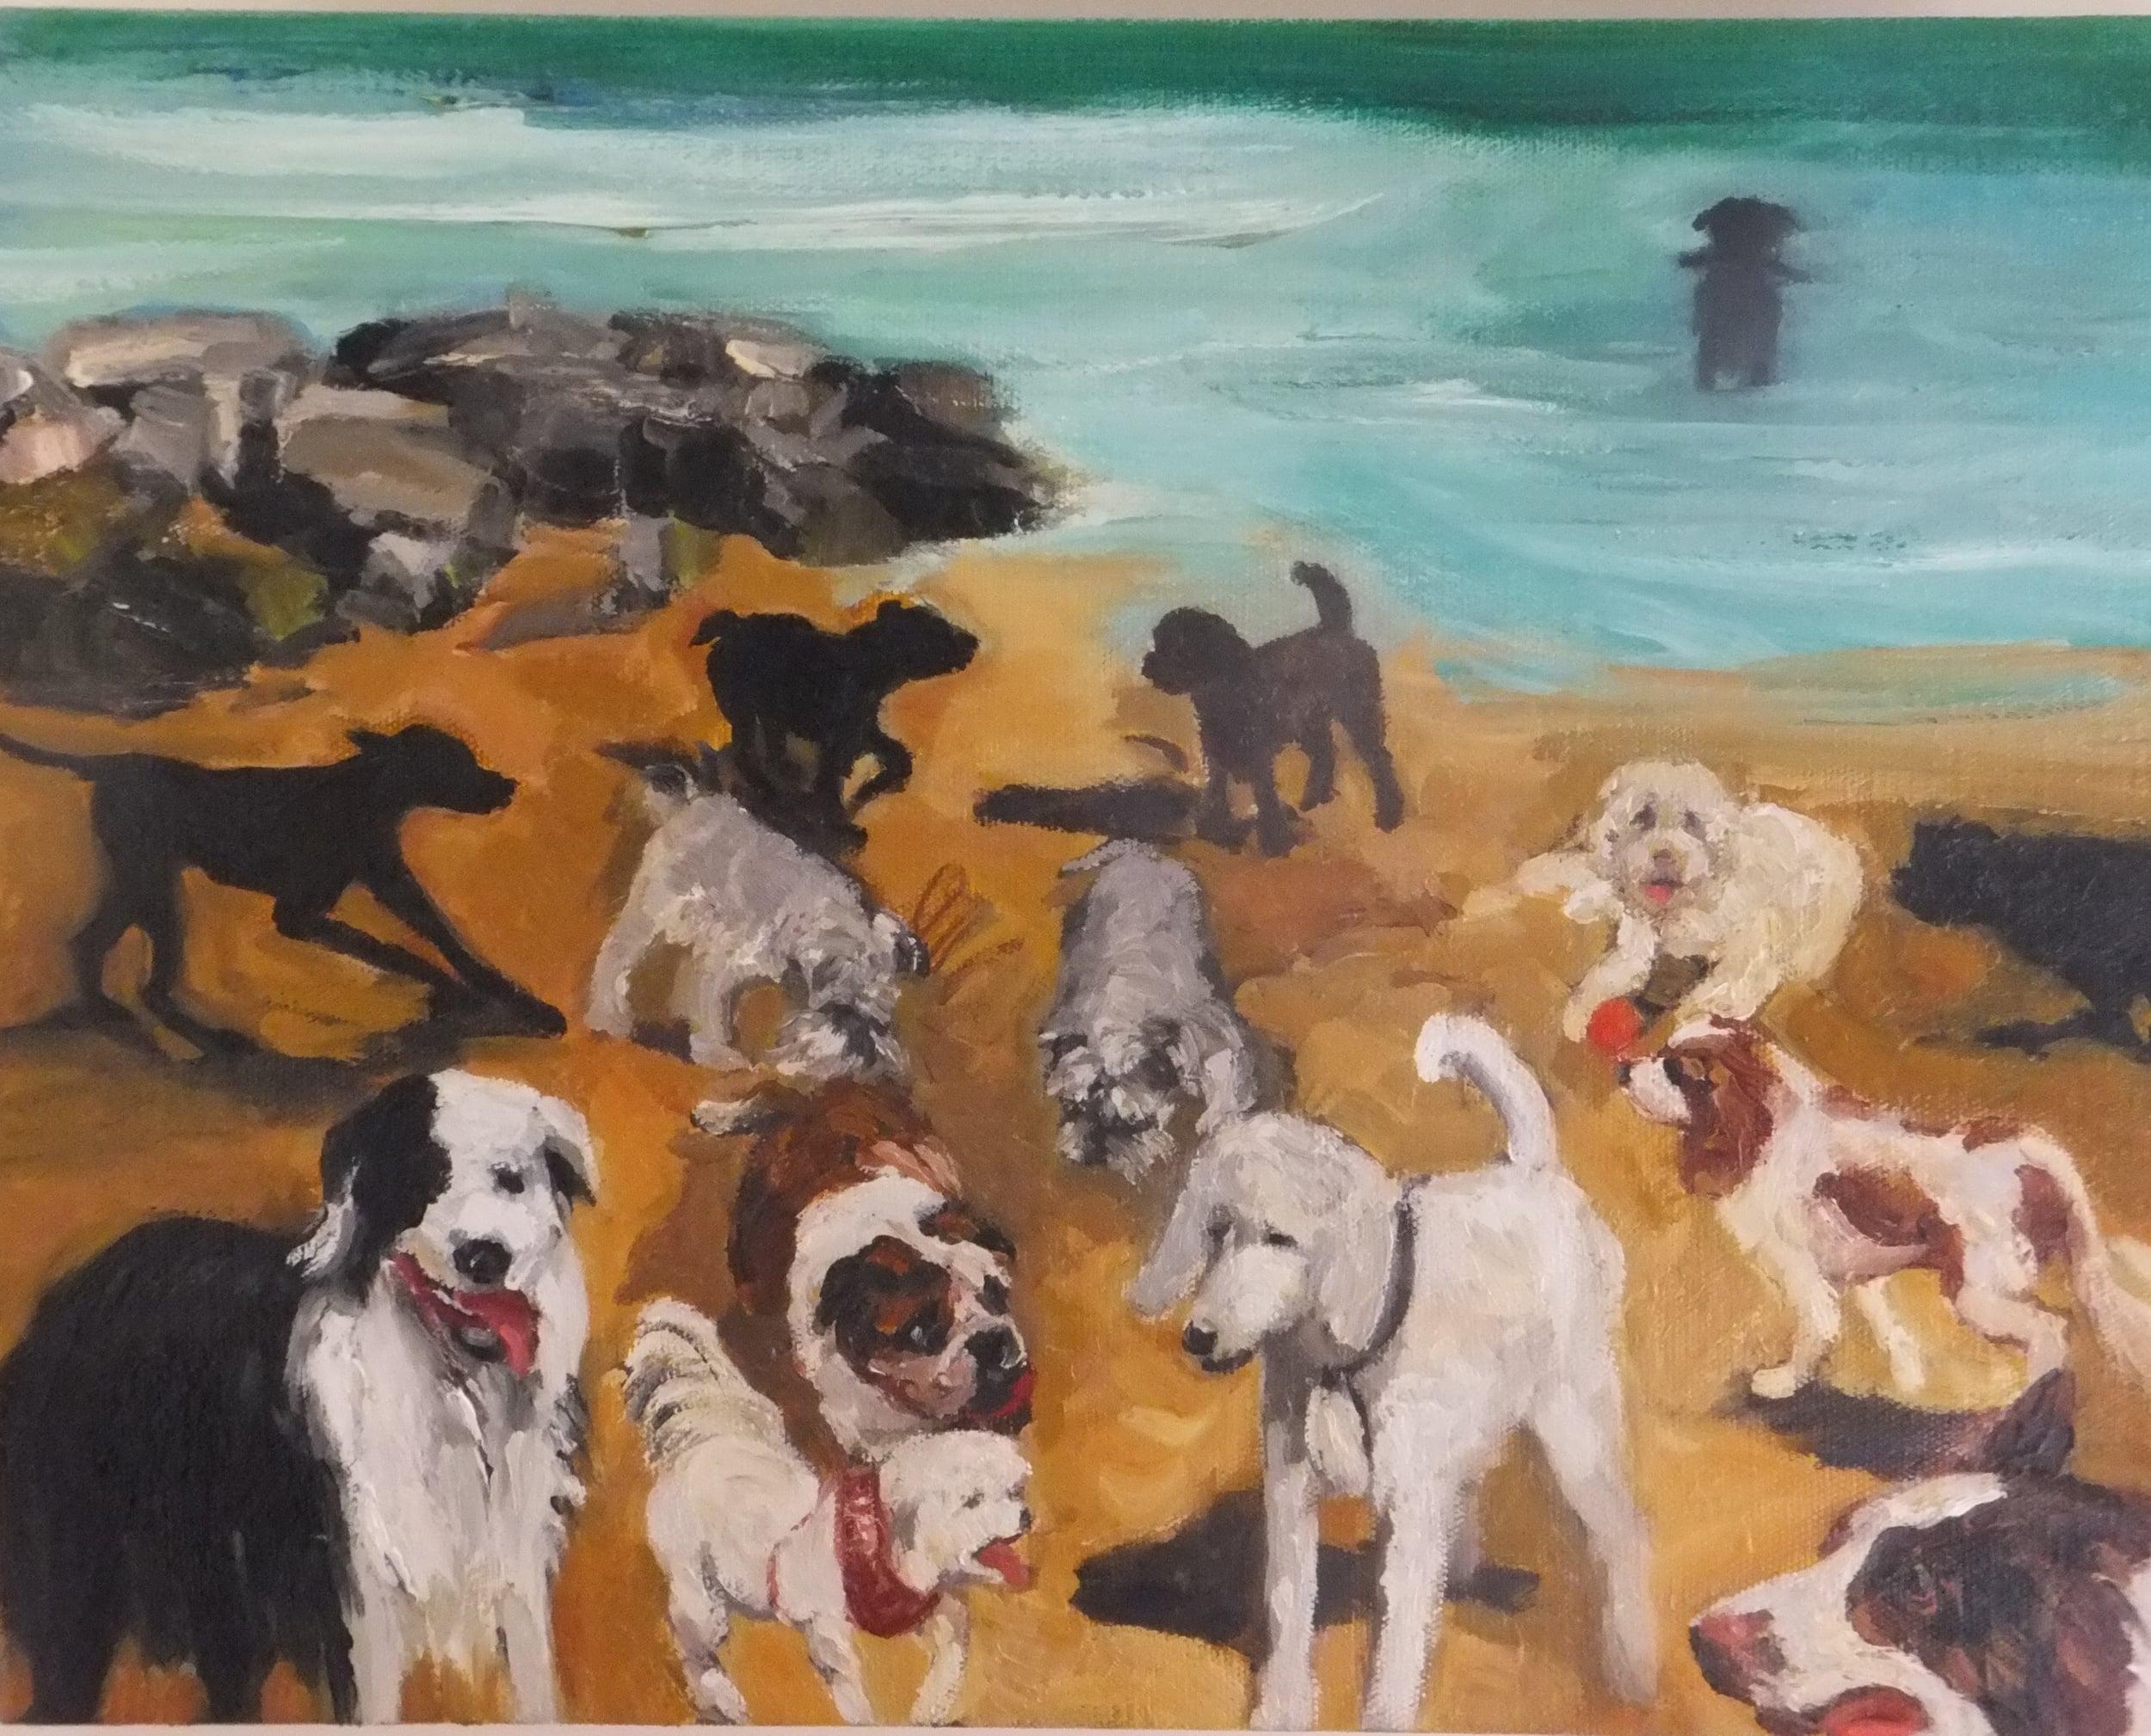 Lydia Miller_Sunday at Horseshoe Beach_oil on canvas_36 x 46 cms.JPG